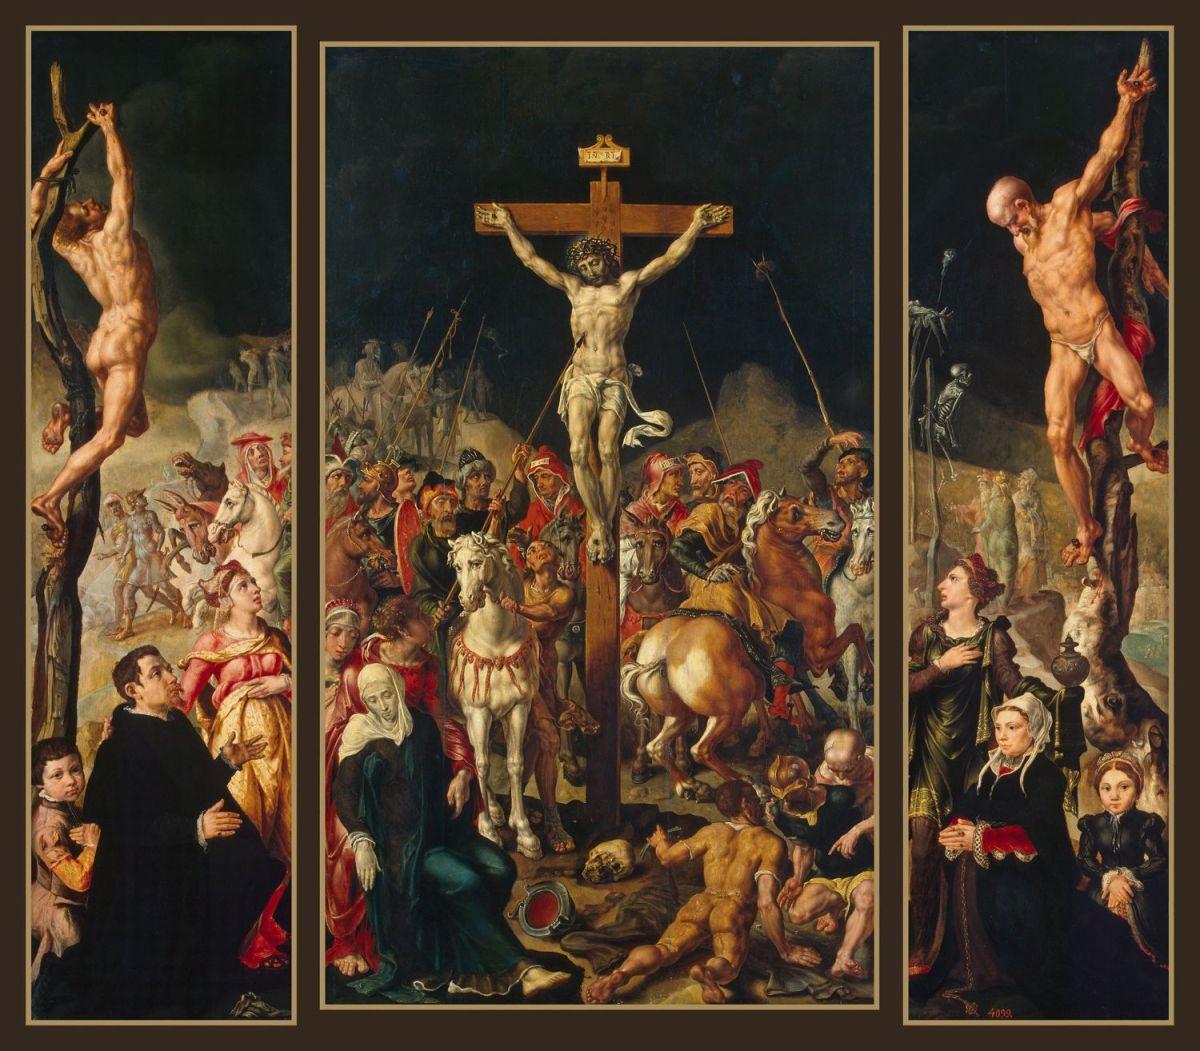 Calvary (Triptych) by Maerten van Heemskerck